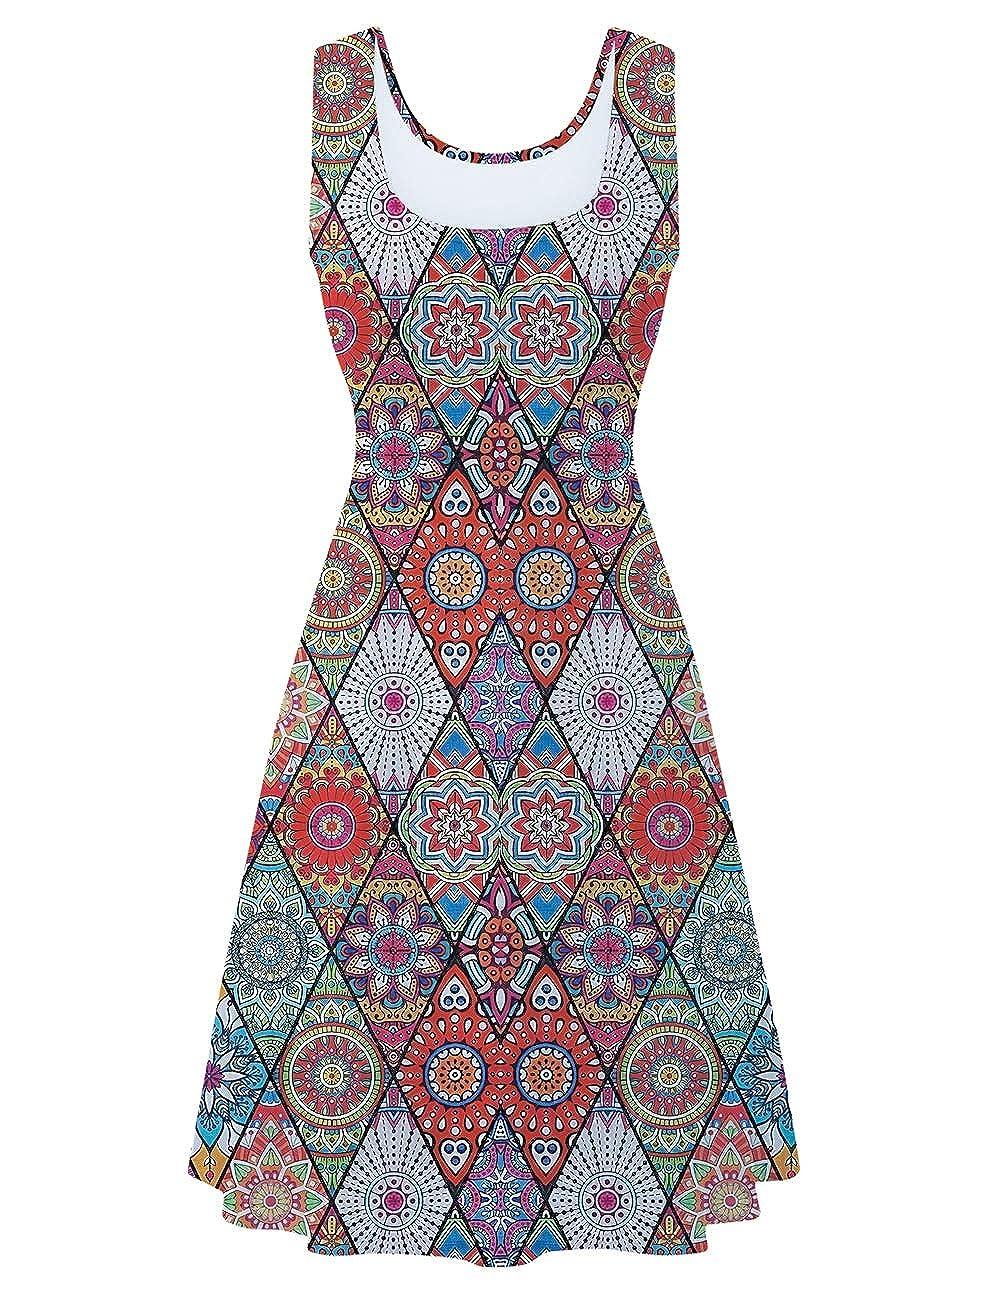 AIDEAONE Womens Sleeveless Dress Vintage Stretchy Sundress 3D Printed Beach Casual A Line Midi Tank Dresses